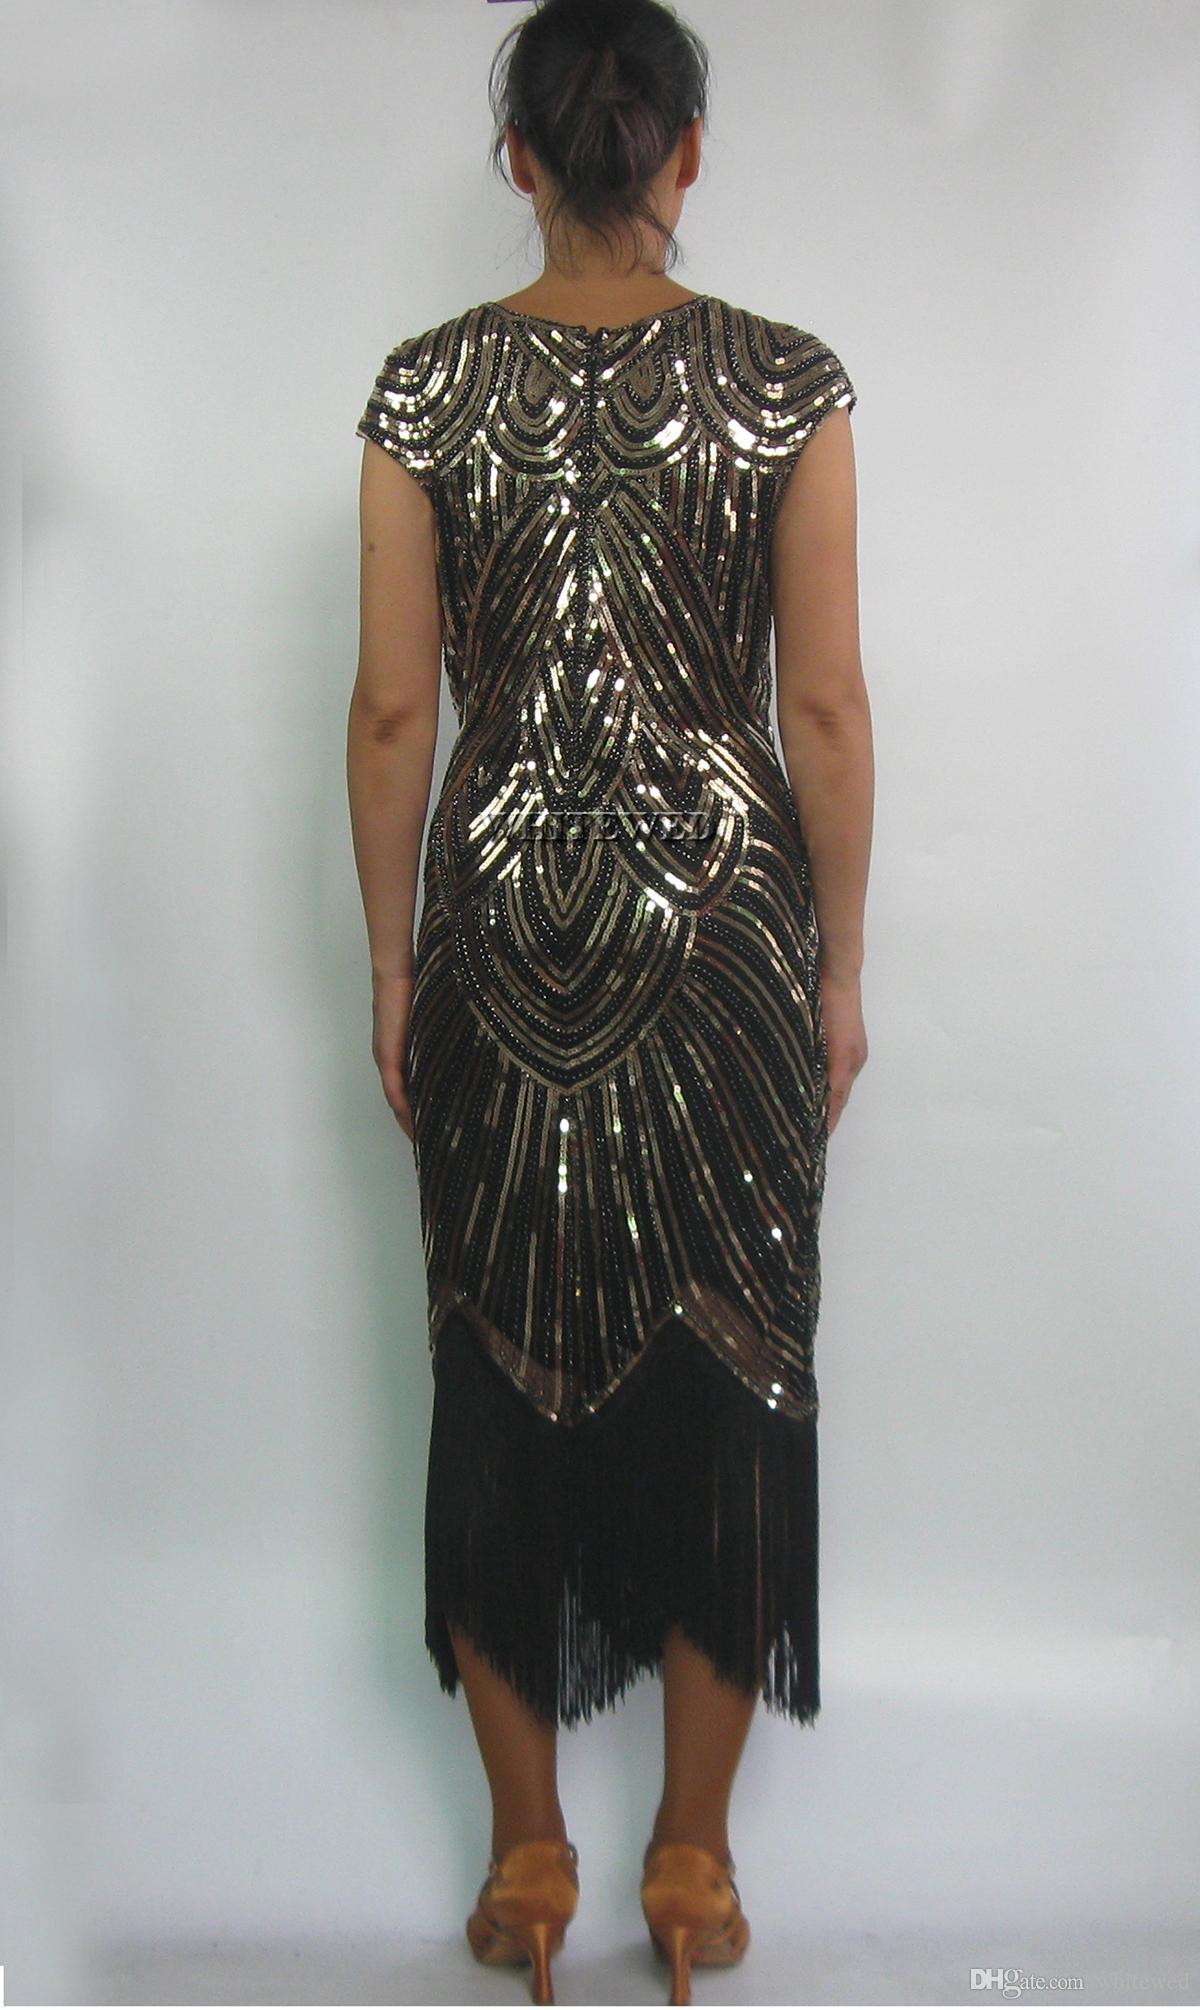 Großhandel Retro Perlen 1920 Art Deco Cocktail Flapper Kleider ...